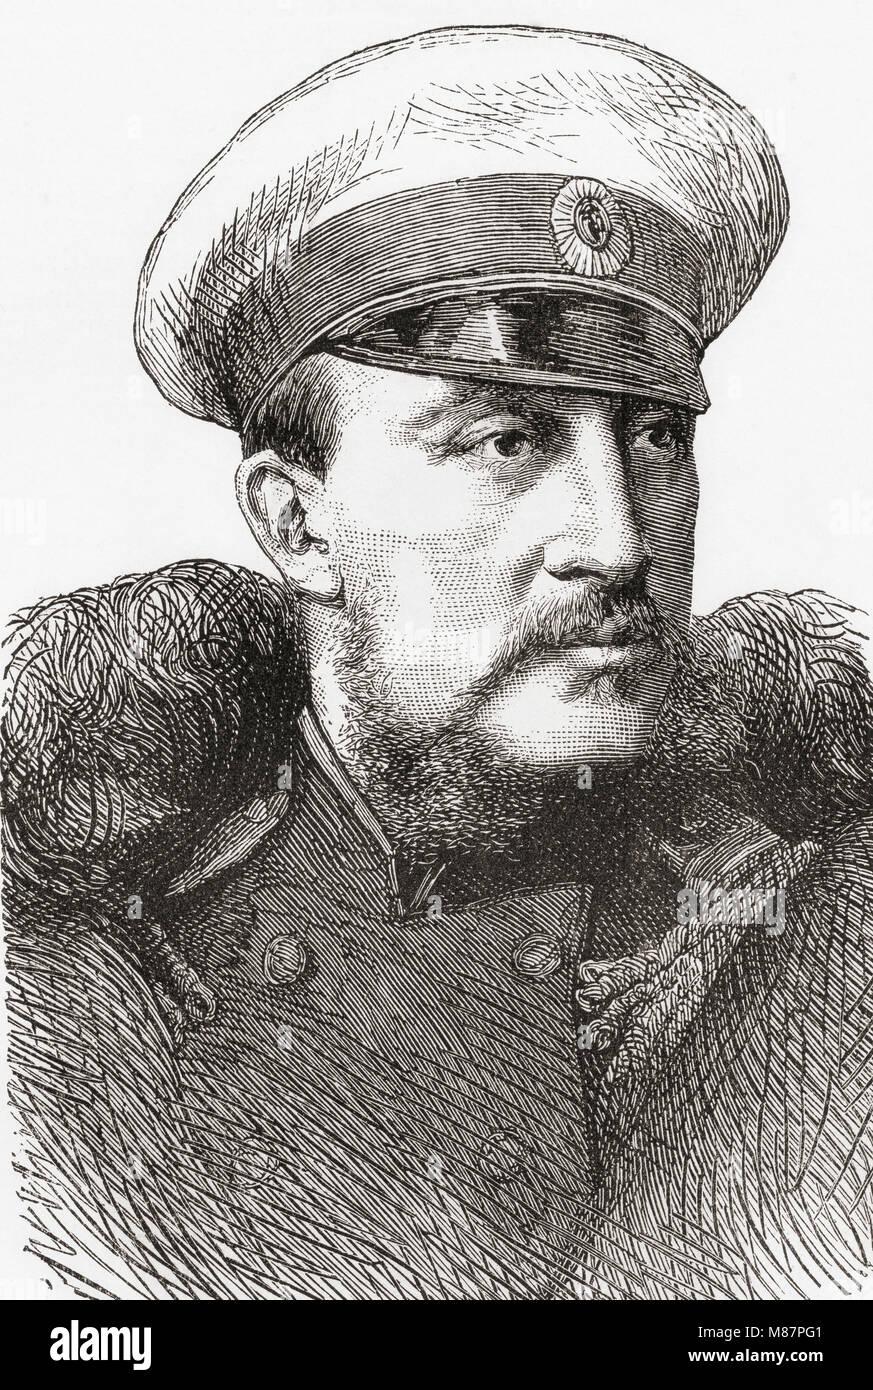 Konstantin Nikolayevich Muravyev, writer. Space and combat fiction, fantasy 74